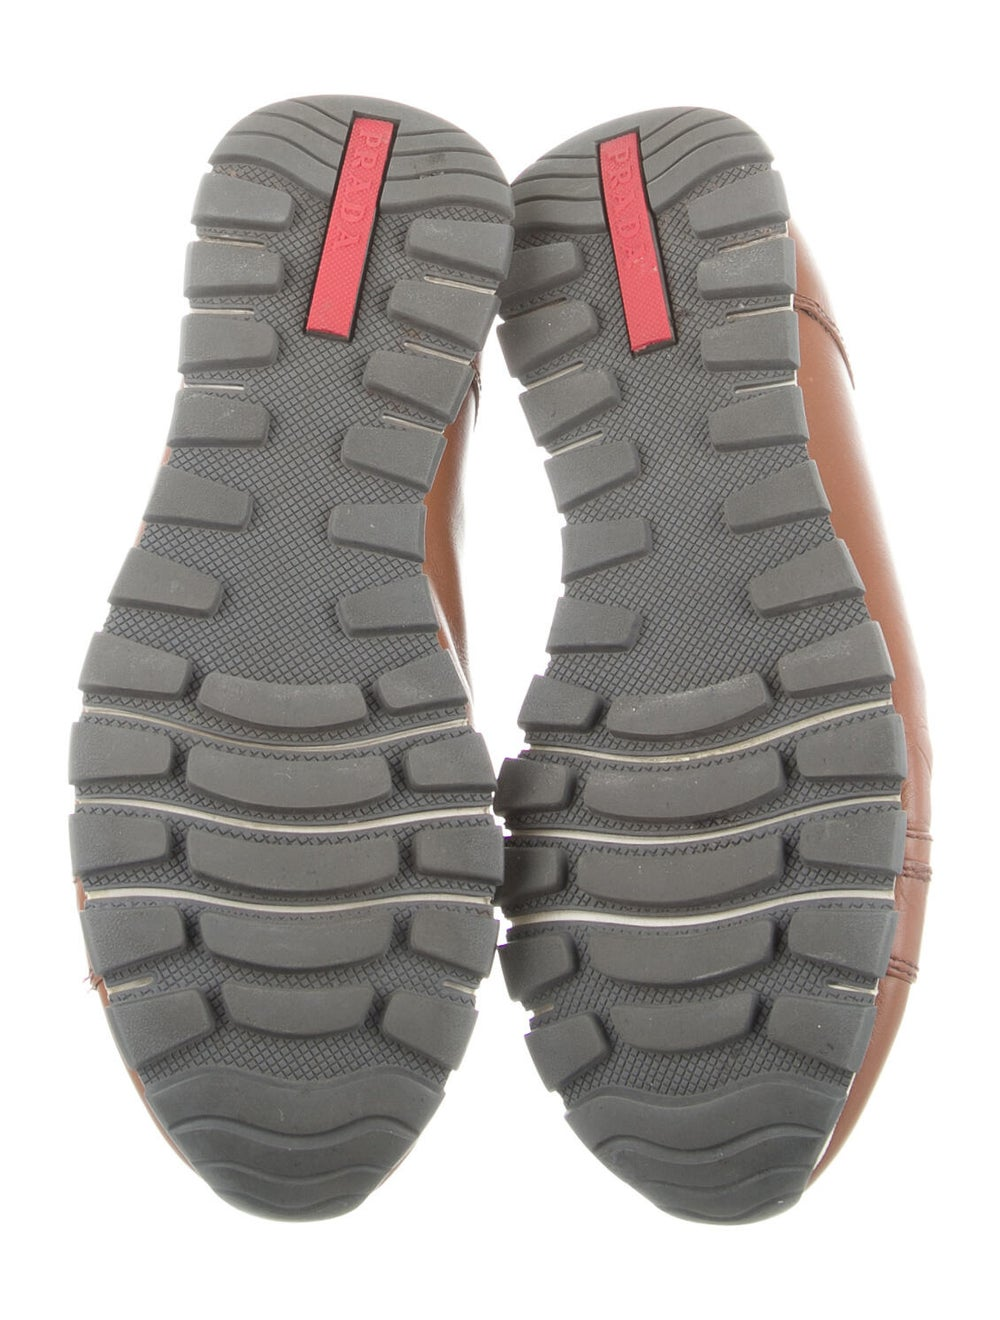 Prada Sport Leather Sneakers Brown - image 5